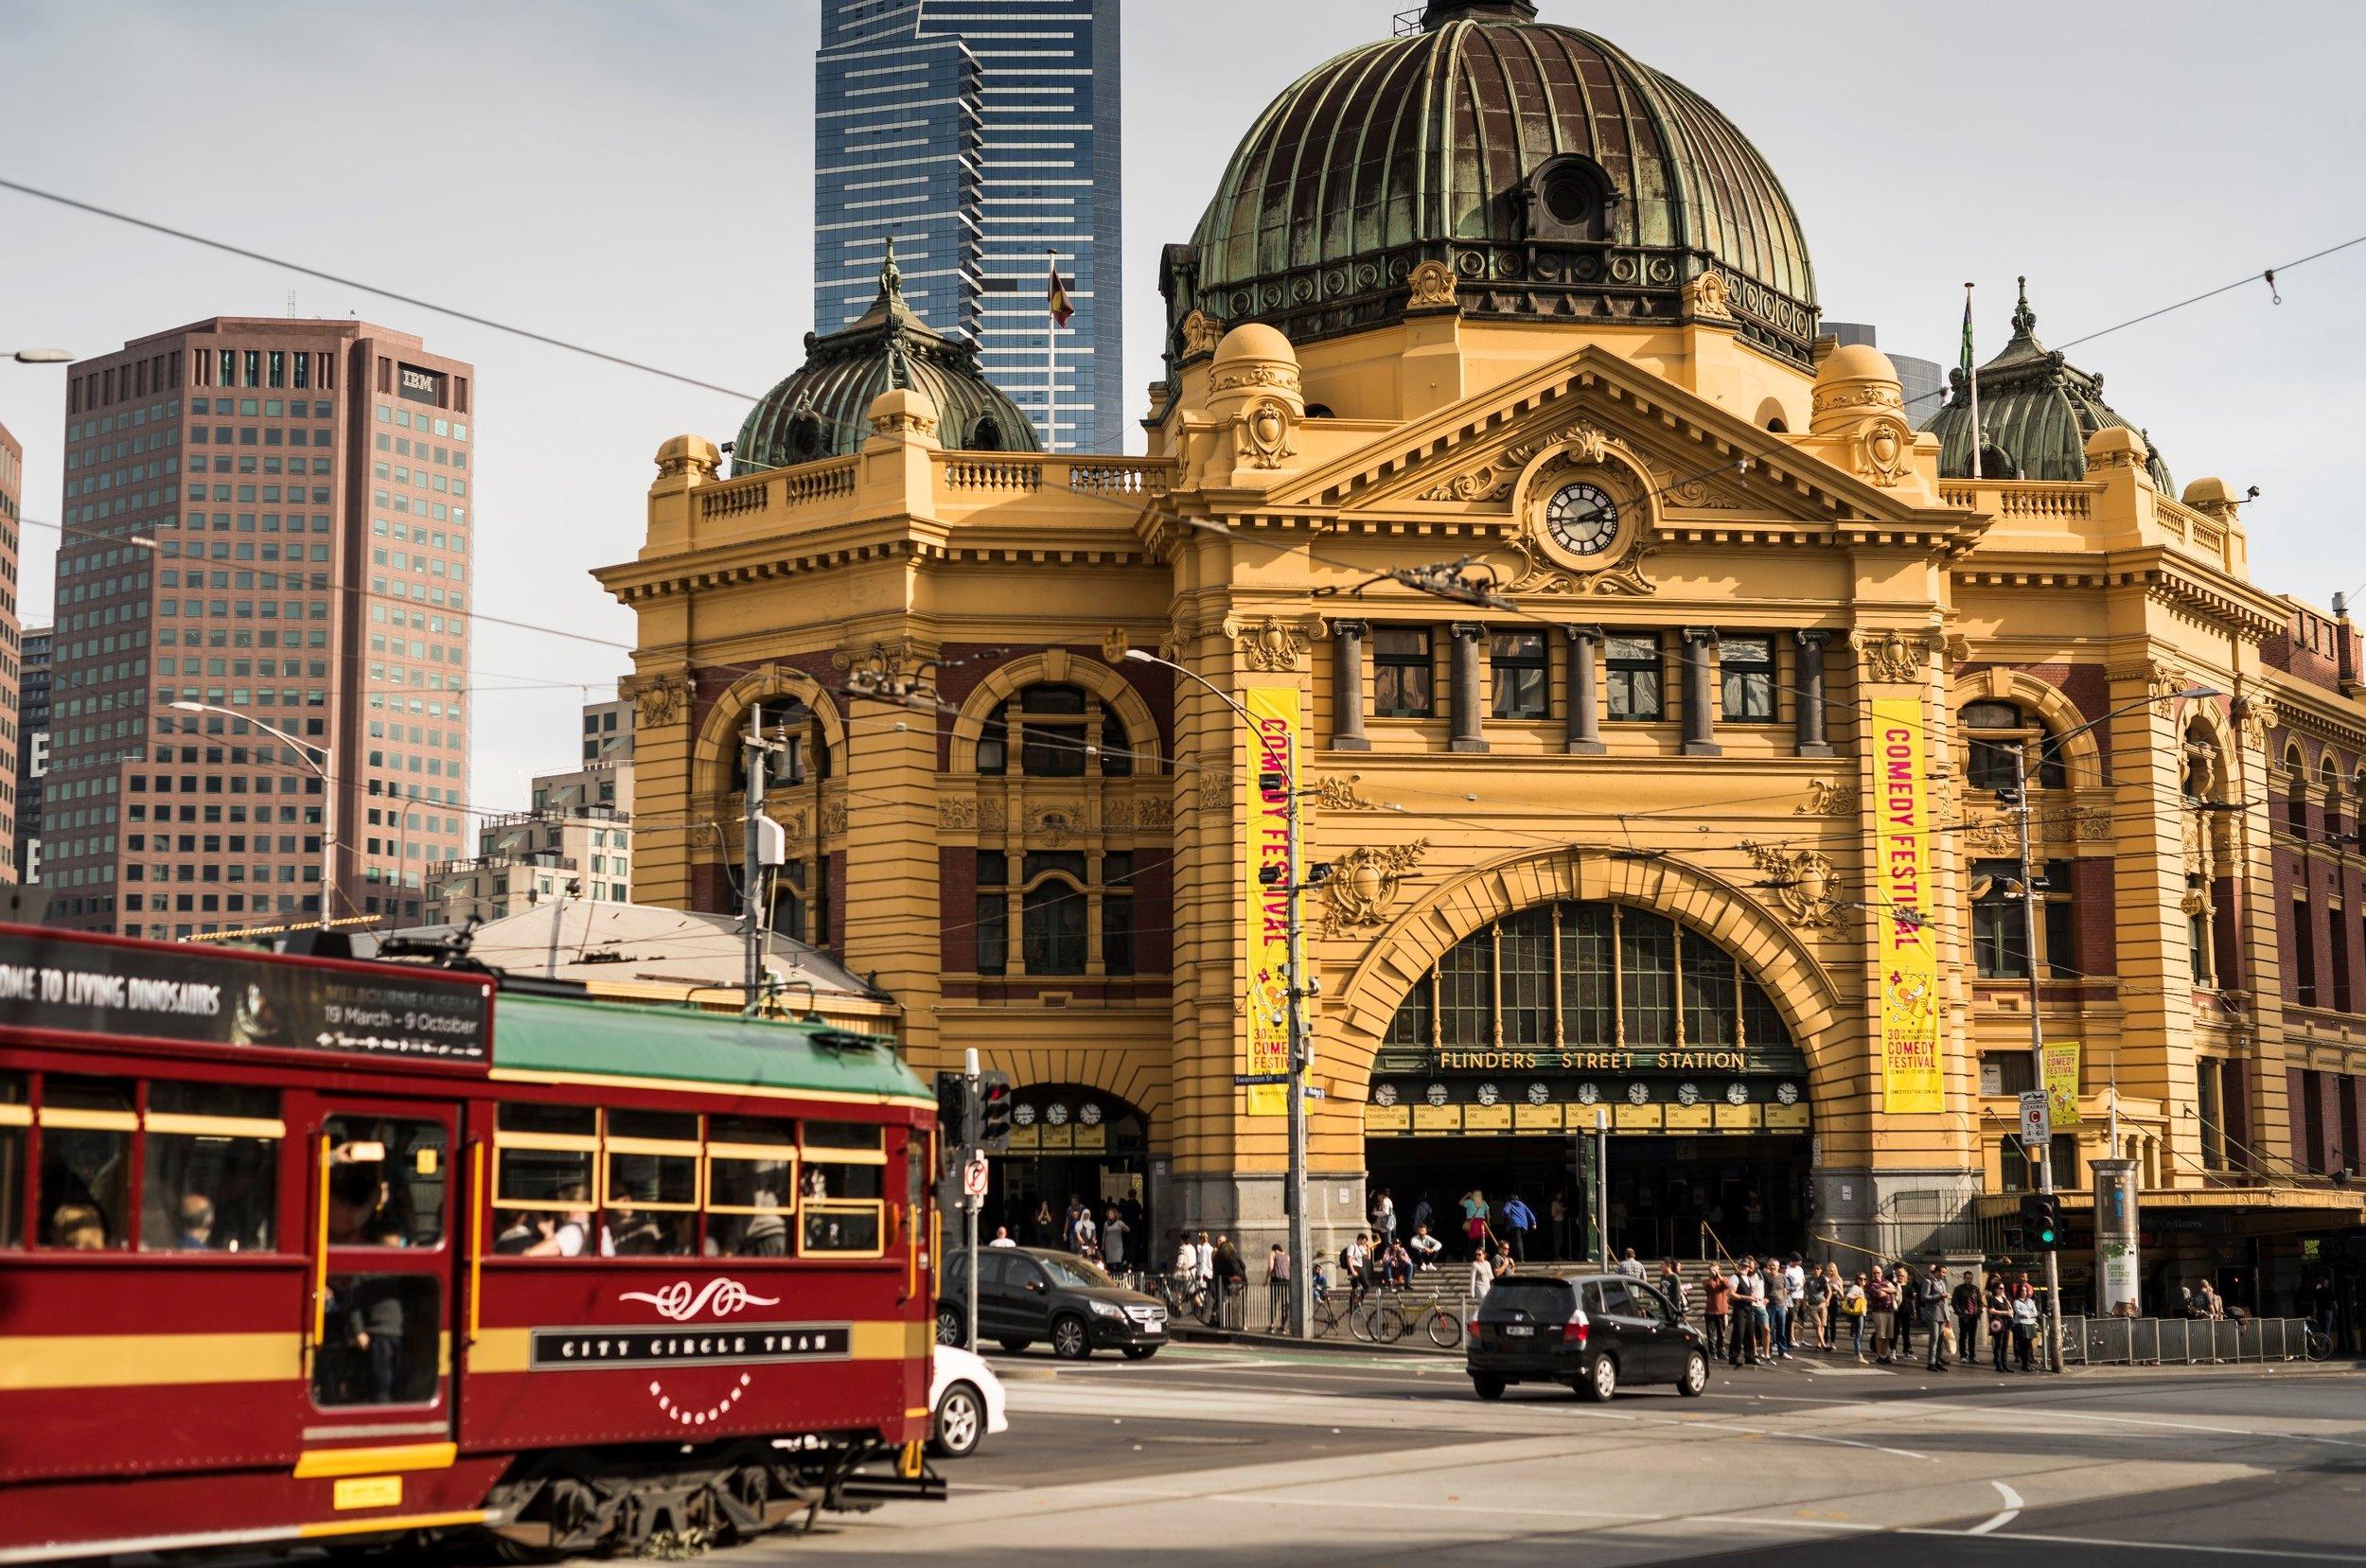 Melbourne Private Tour-Show Me Melbourne-Flinders St Station